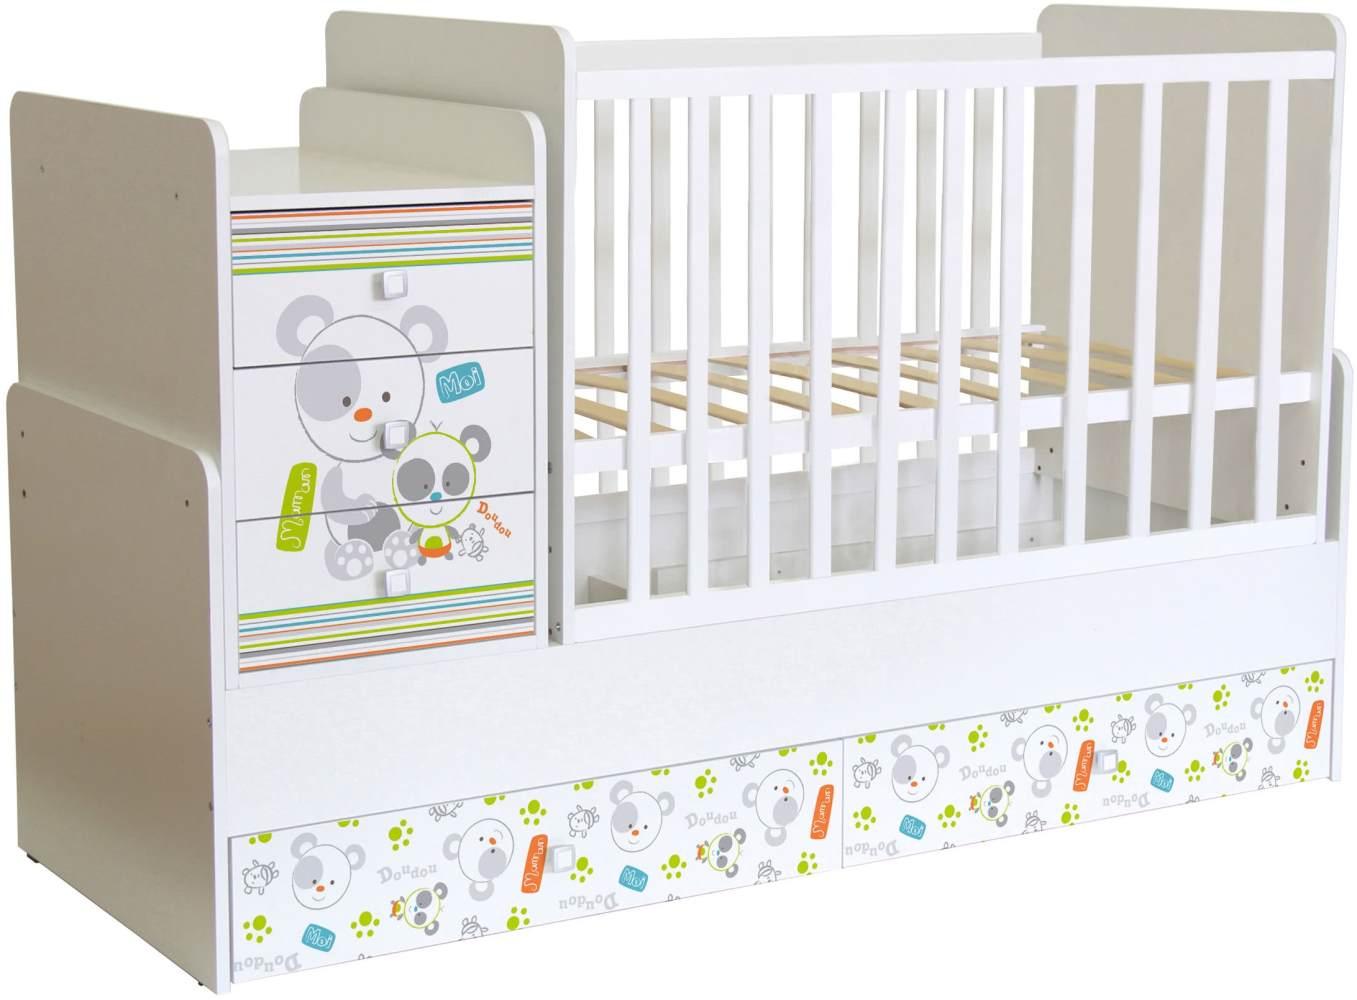 Polini Kids 'Simple 1100' Kombi-Kinderbett 60 x 120/170 cm, weiß, Panda, höhenverstellbar, mit Schaukelfunktion, inkl. Kommode Bild 1